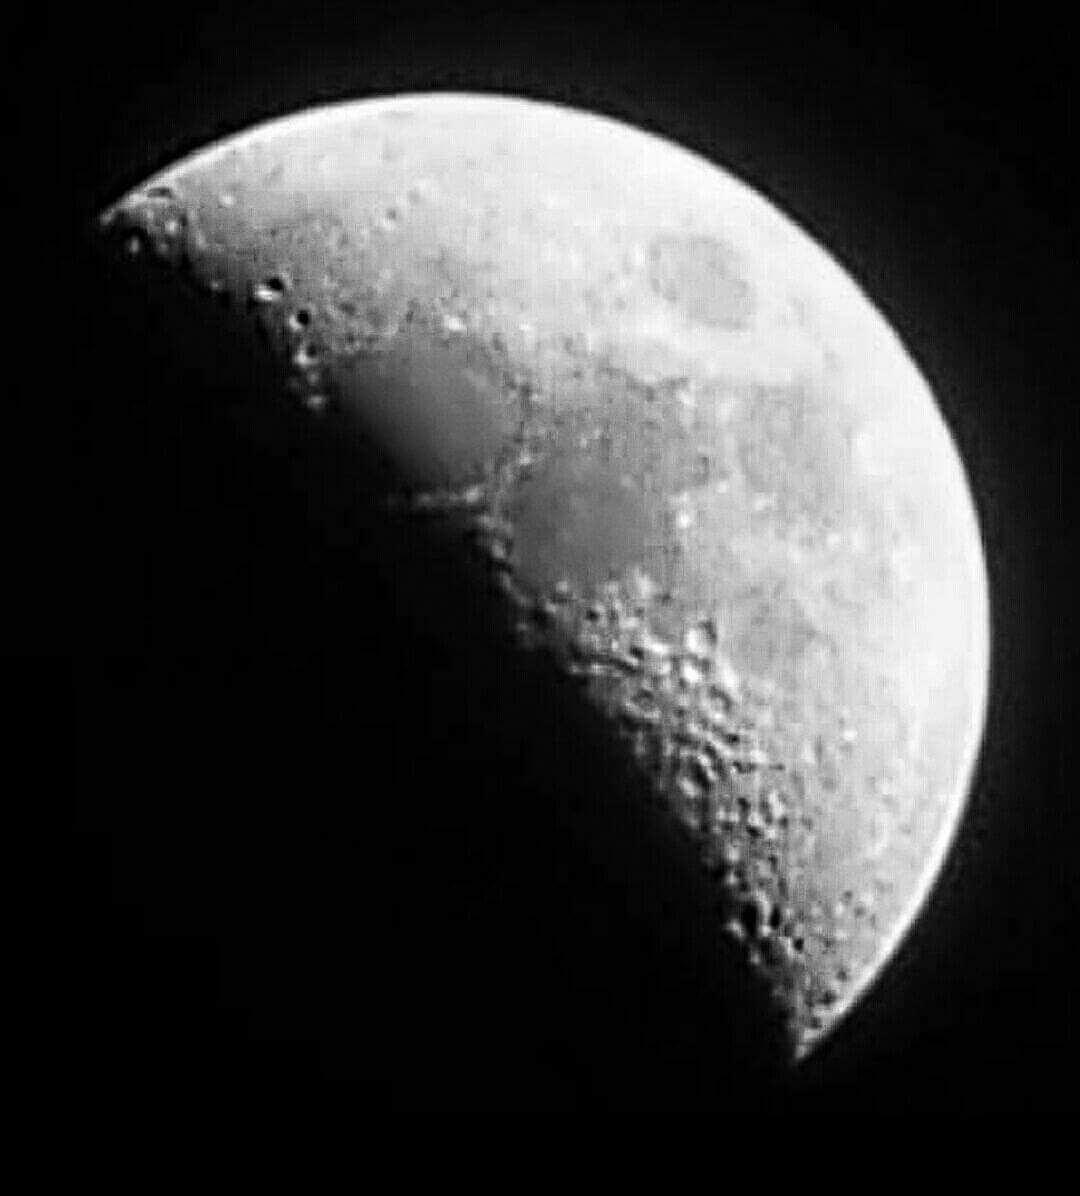 moon by Shawky Ahmed